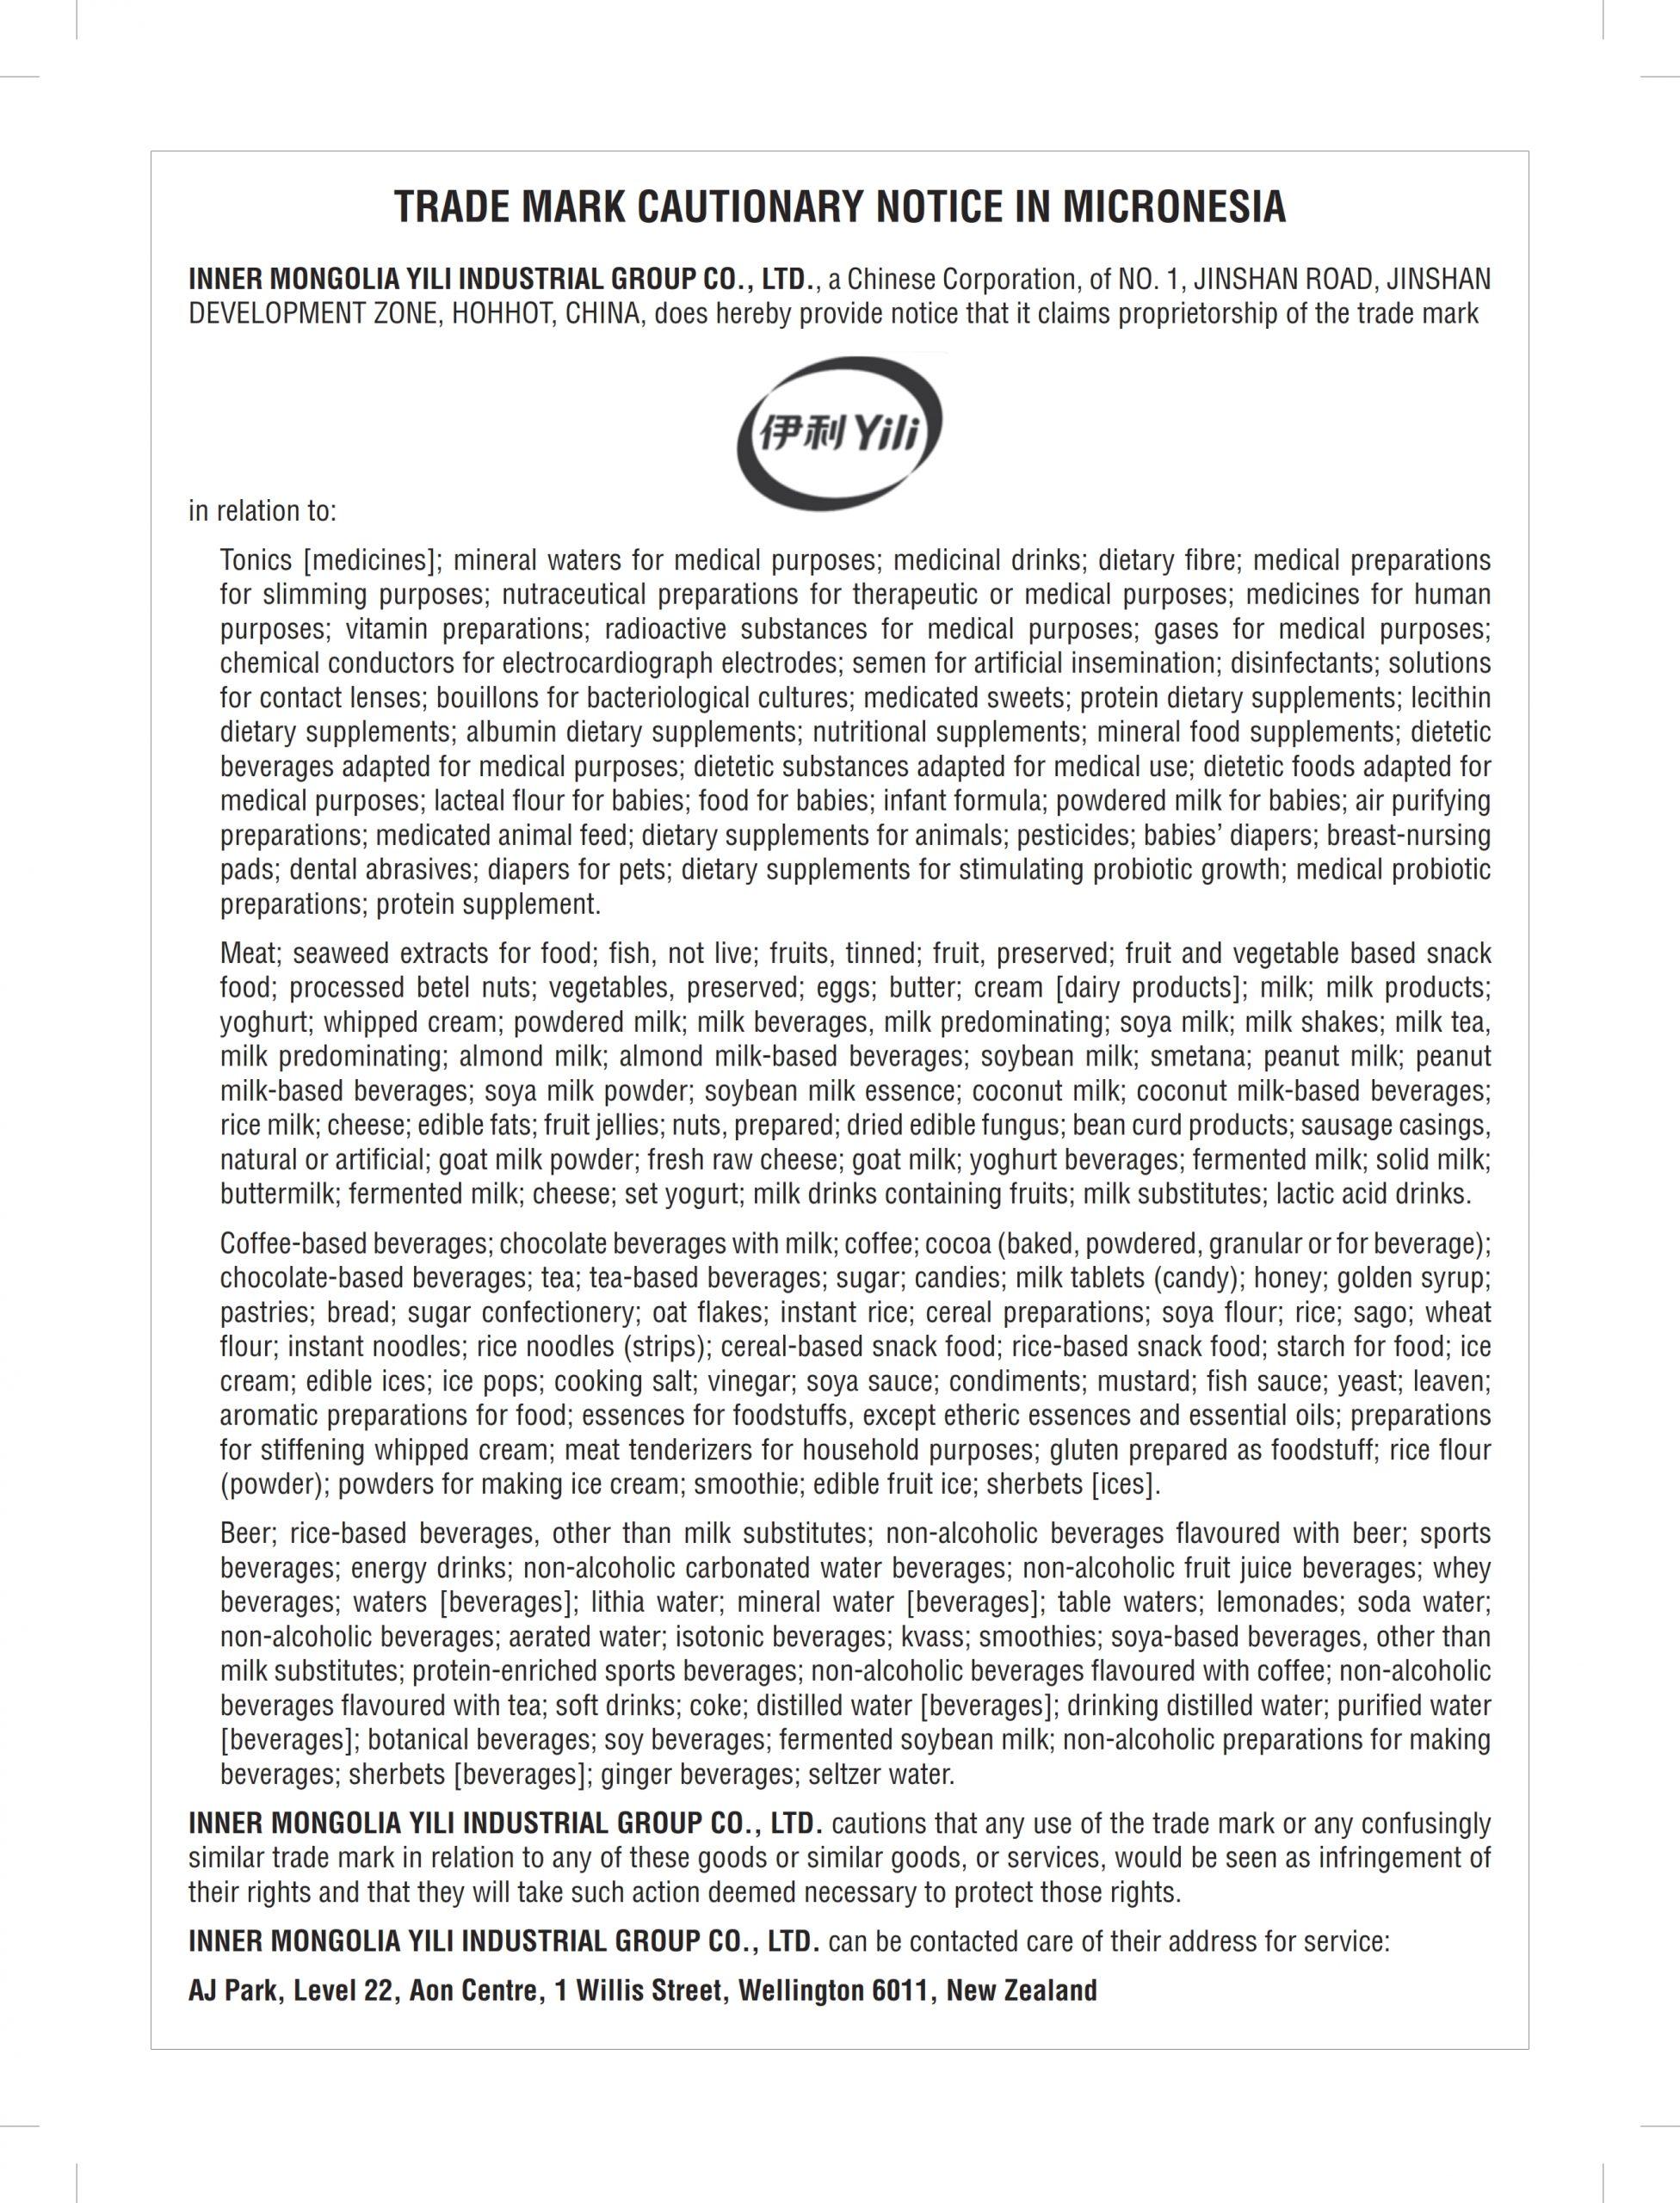 Cautionary Notice Micronesia Chinese ref 883432